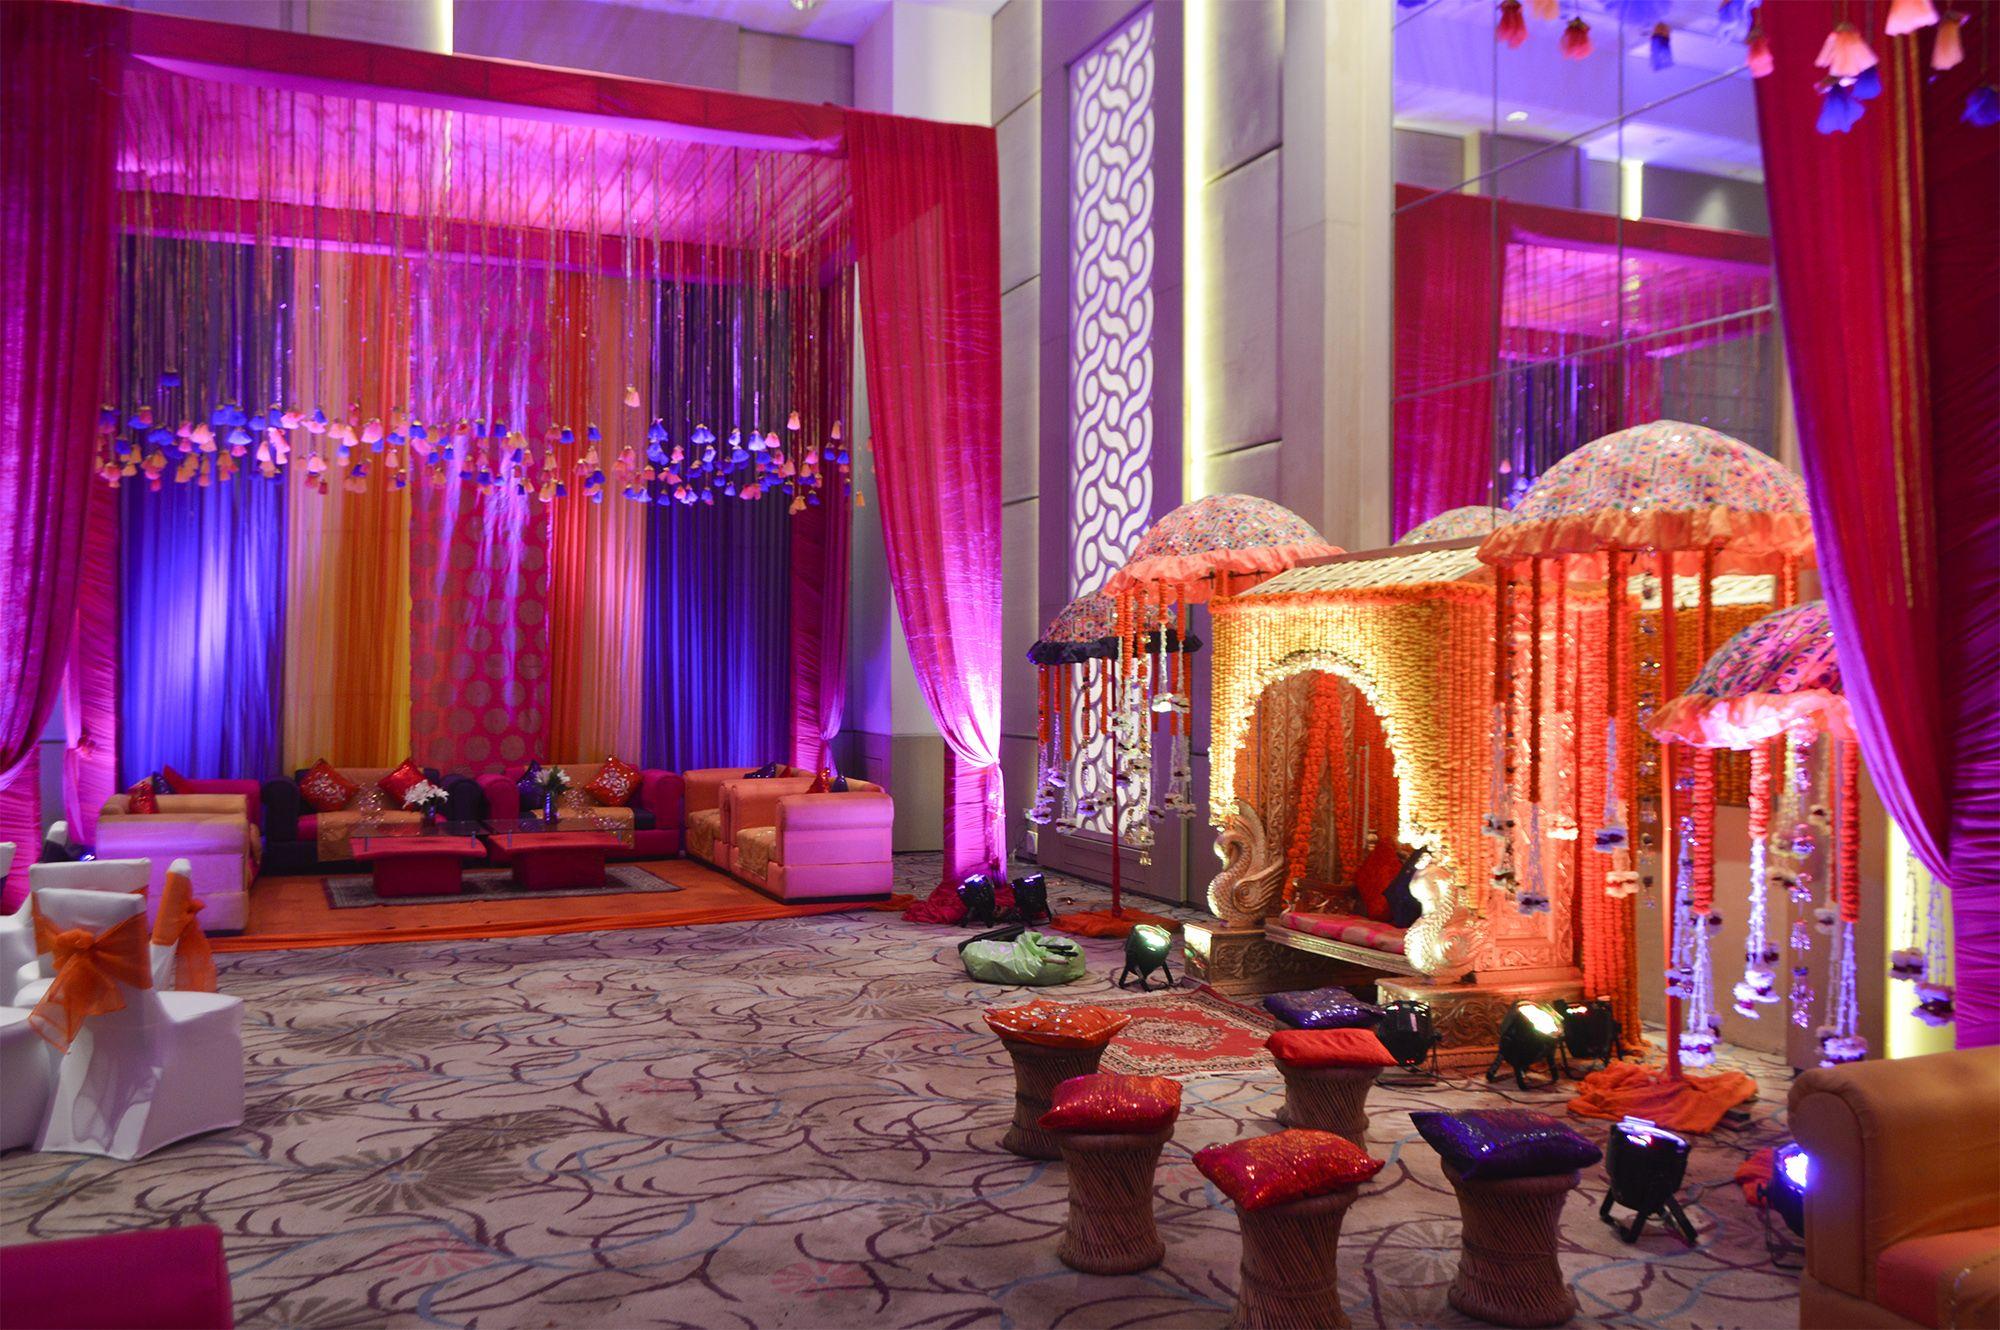 le meridian Gurgaon, wedding venue